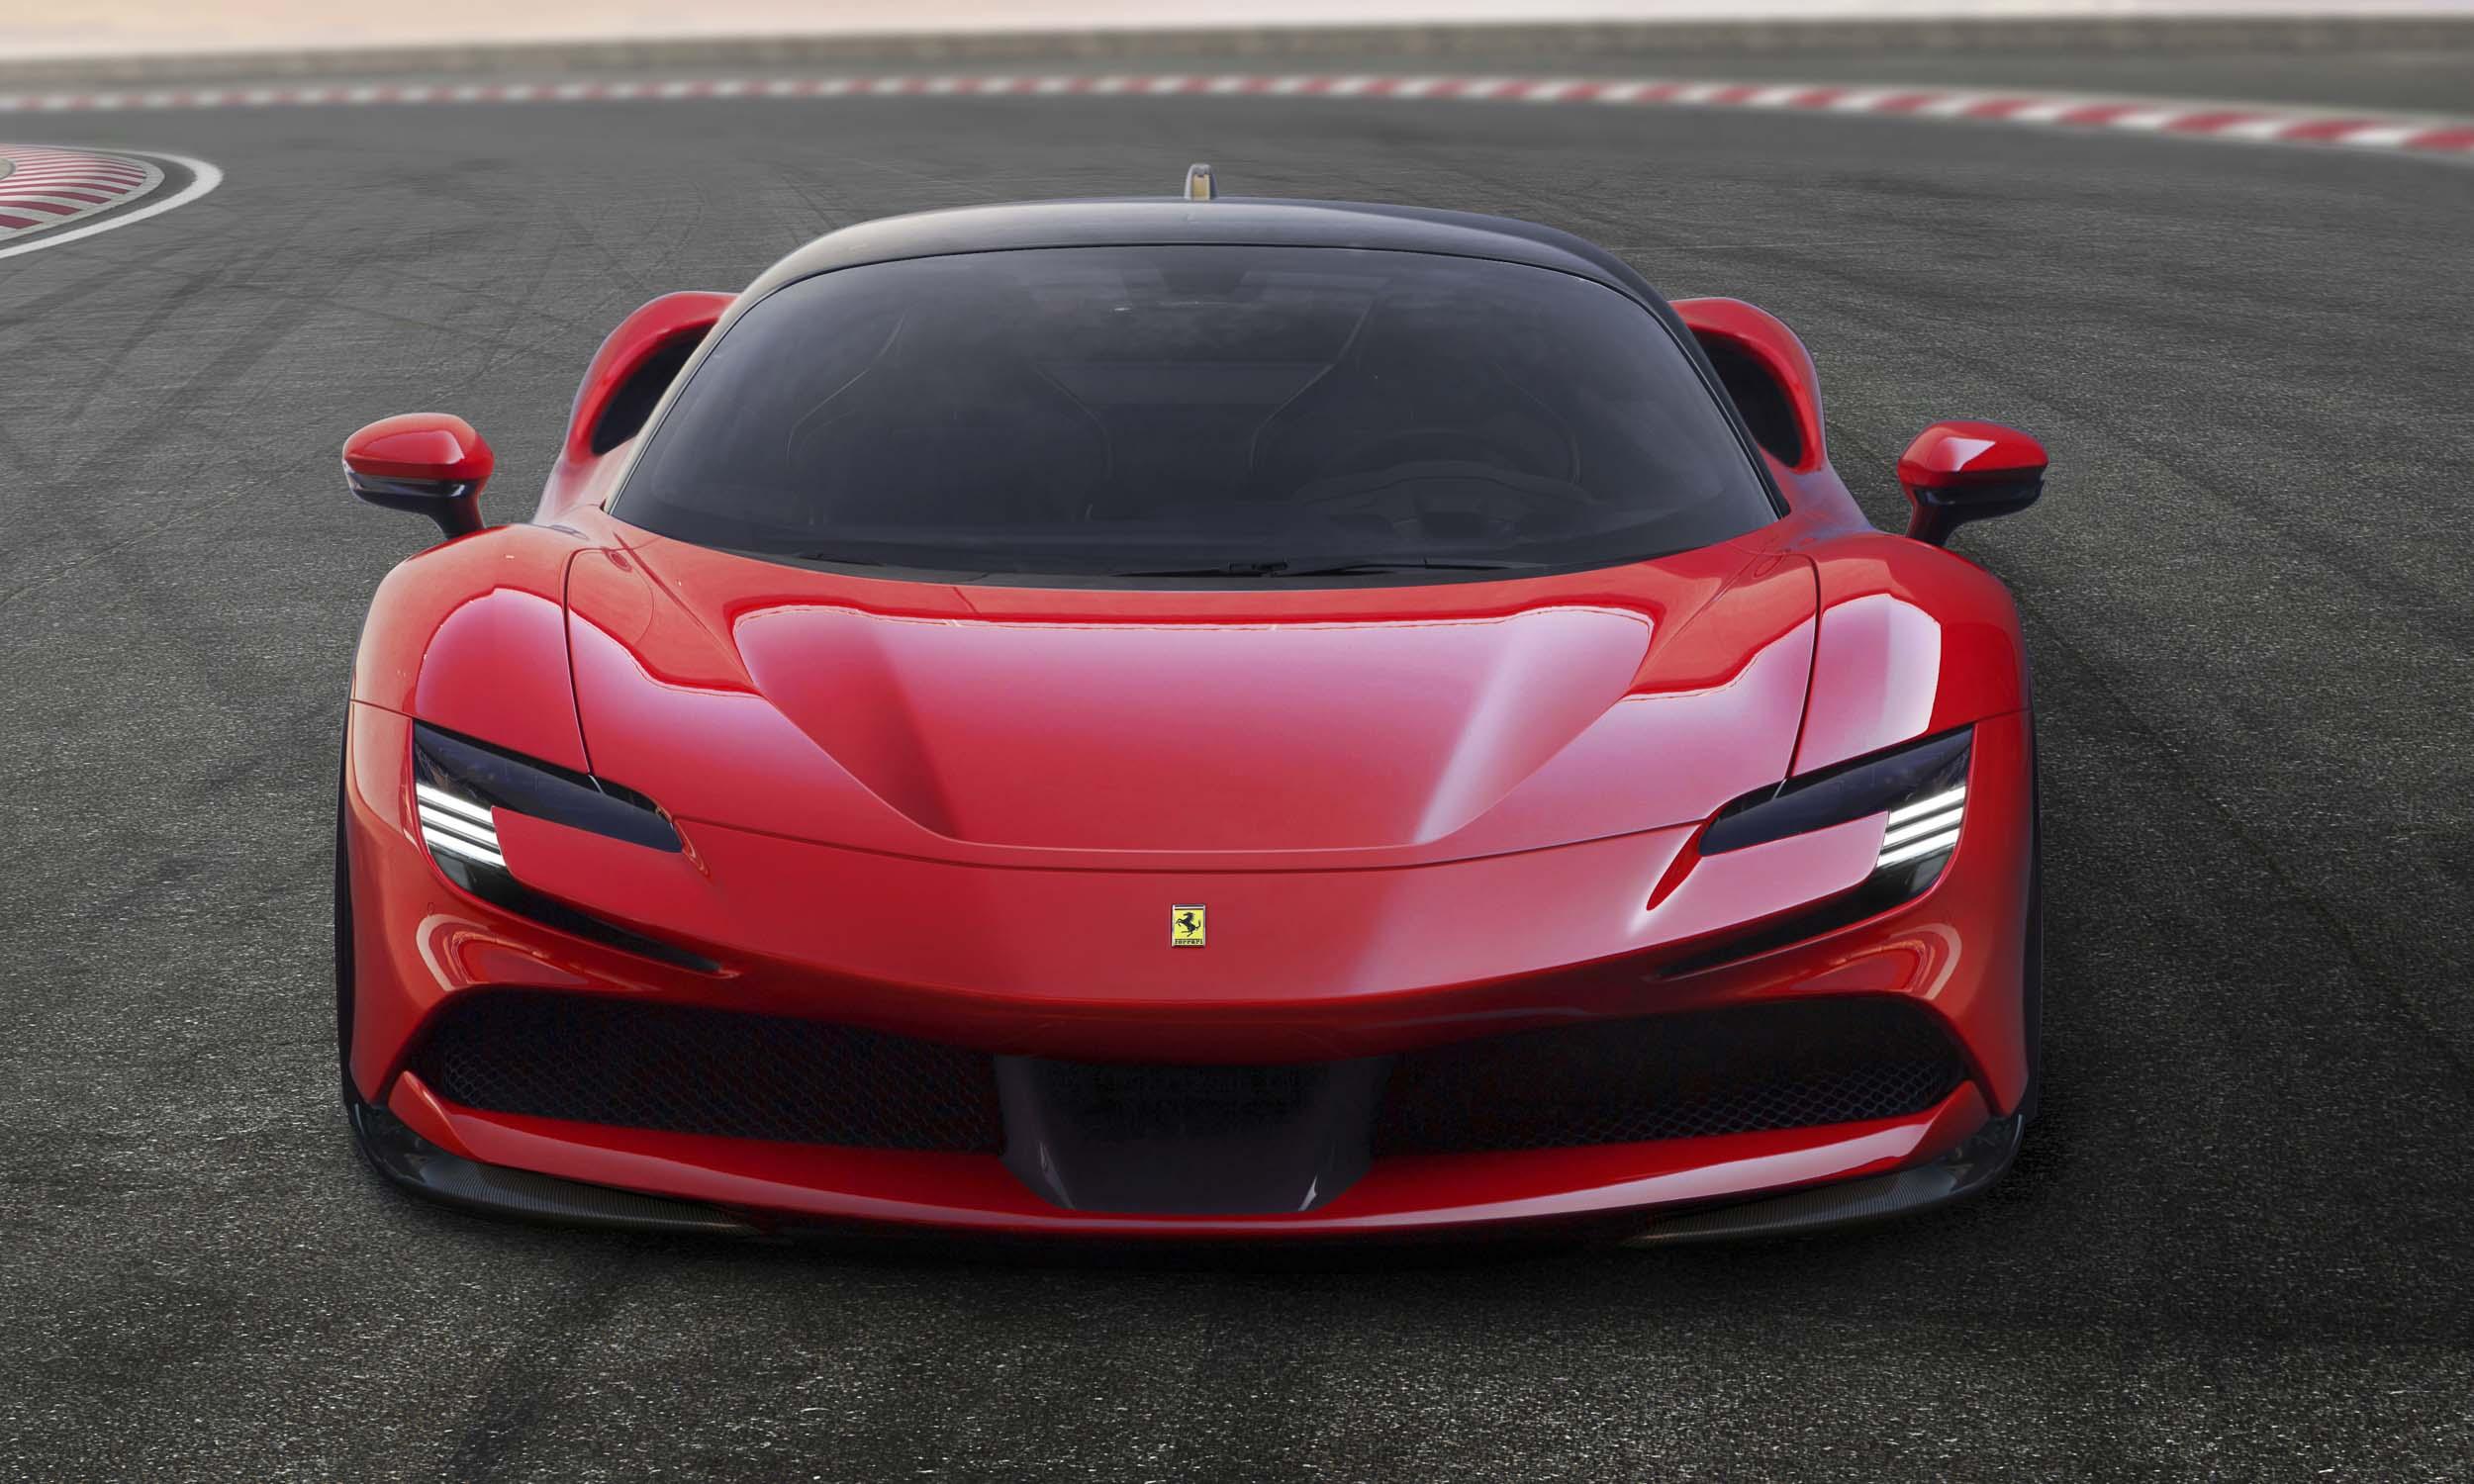 Ferrari SF90 Stradale: First Look